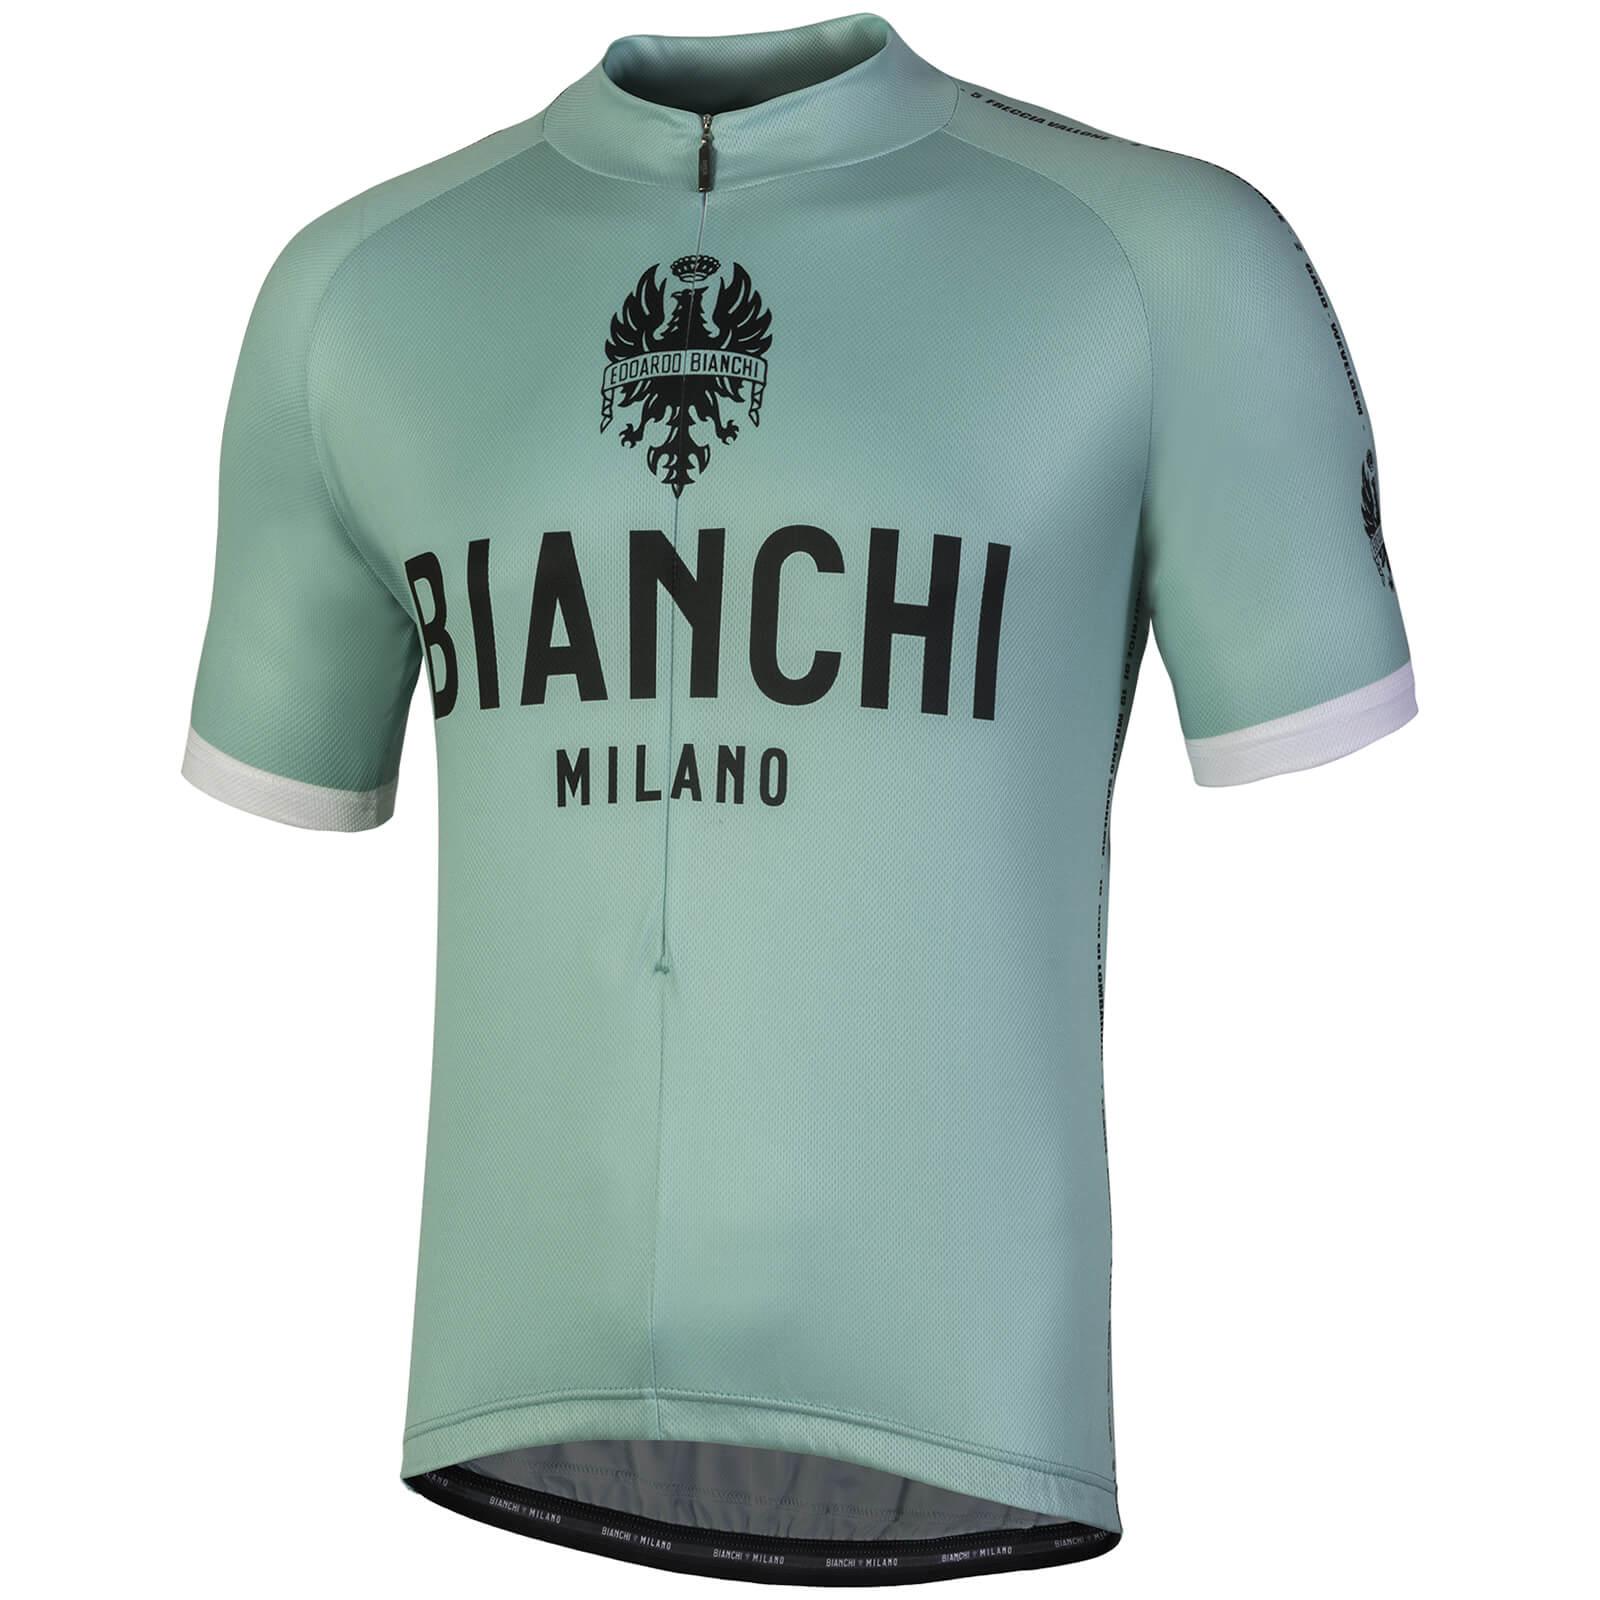 288fae9fe Bianchi Pride Short Sleeve Jersey - Celeste